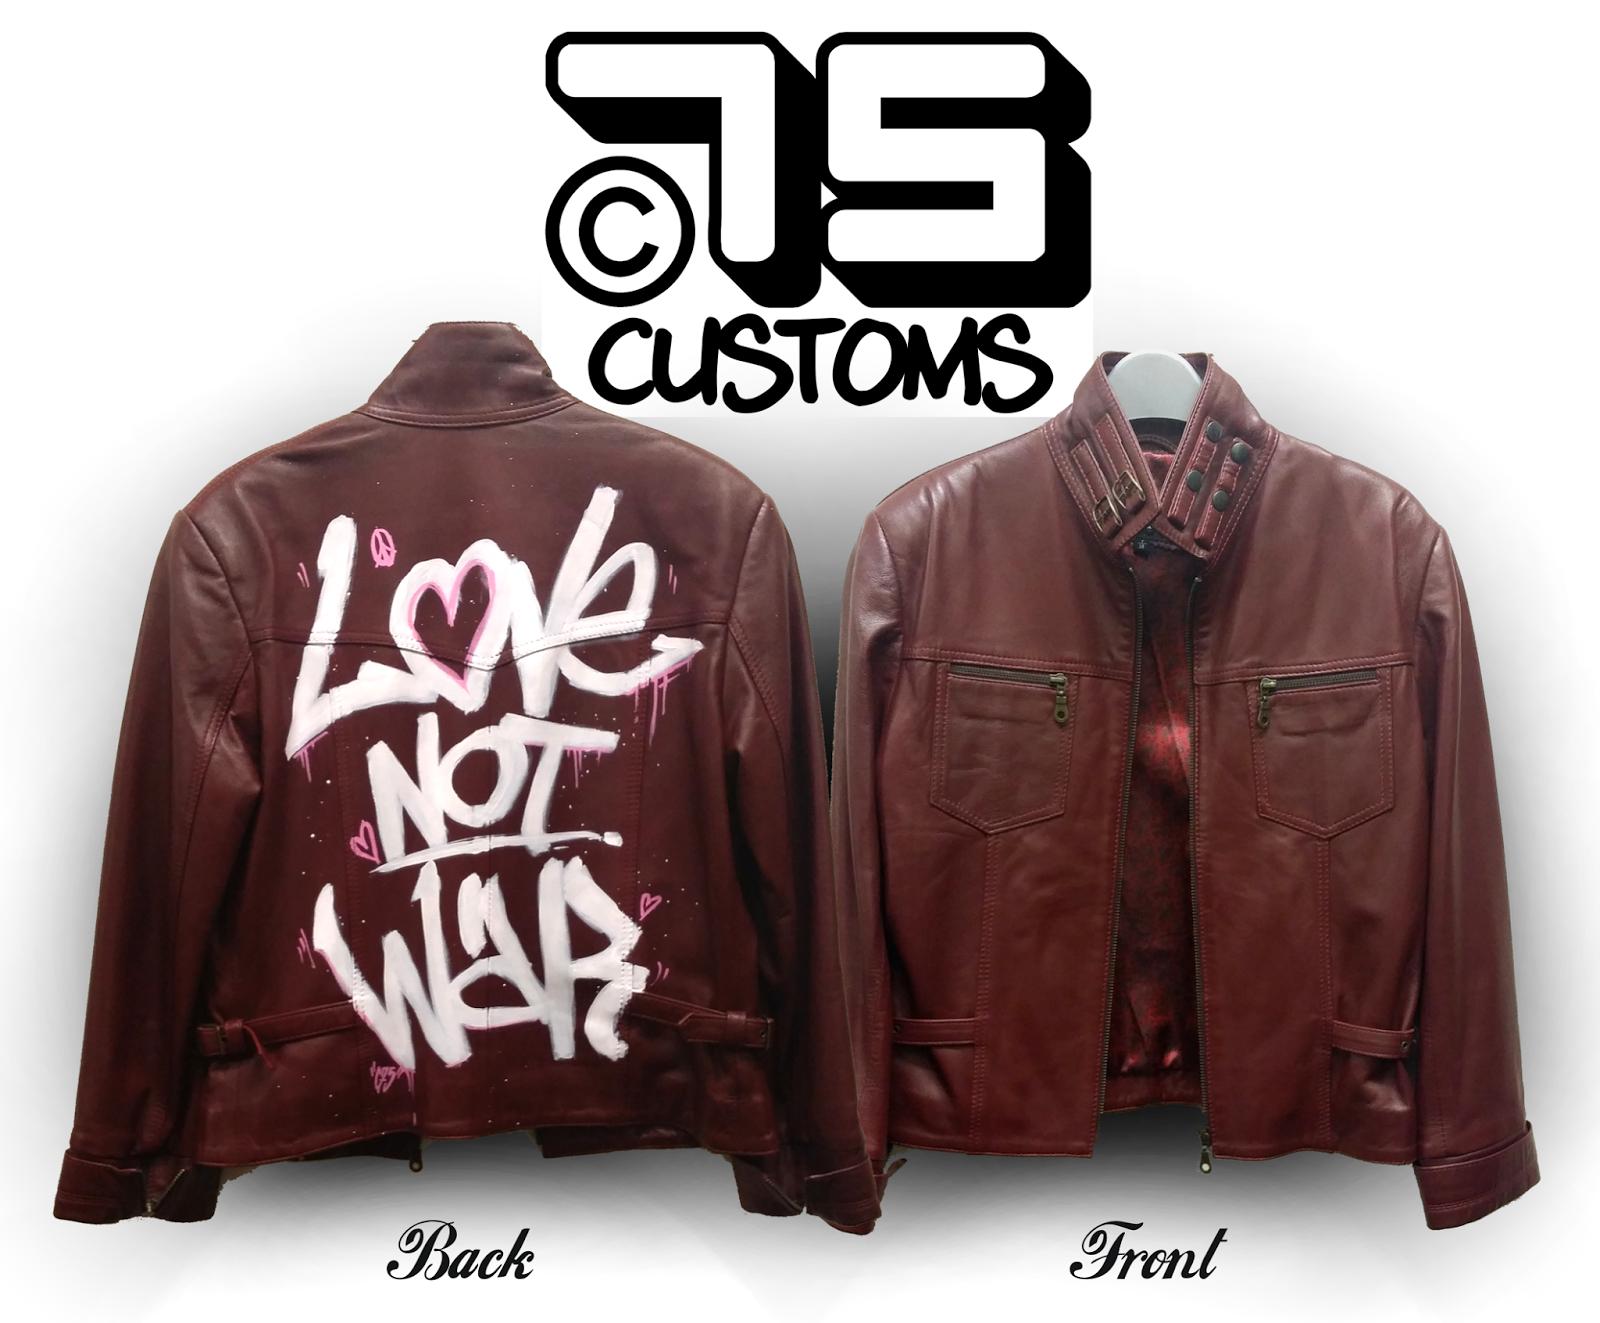 http://c75.bigcartel.com/product/love-not-war-jacket